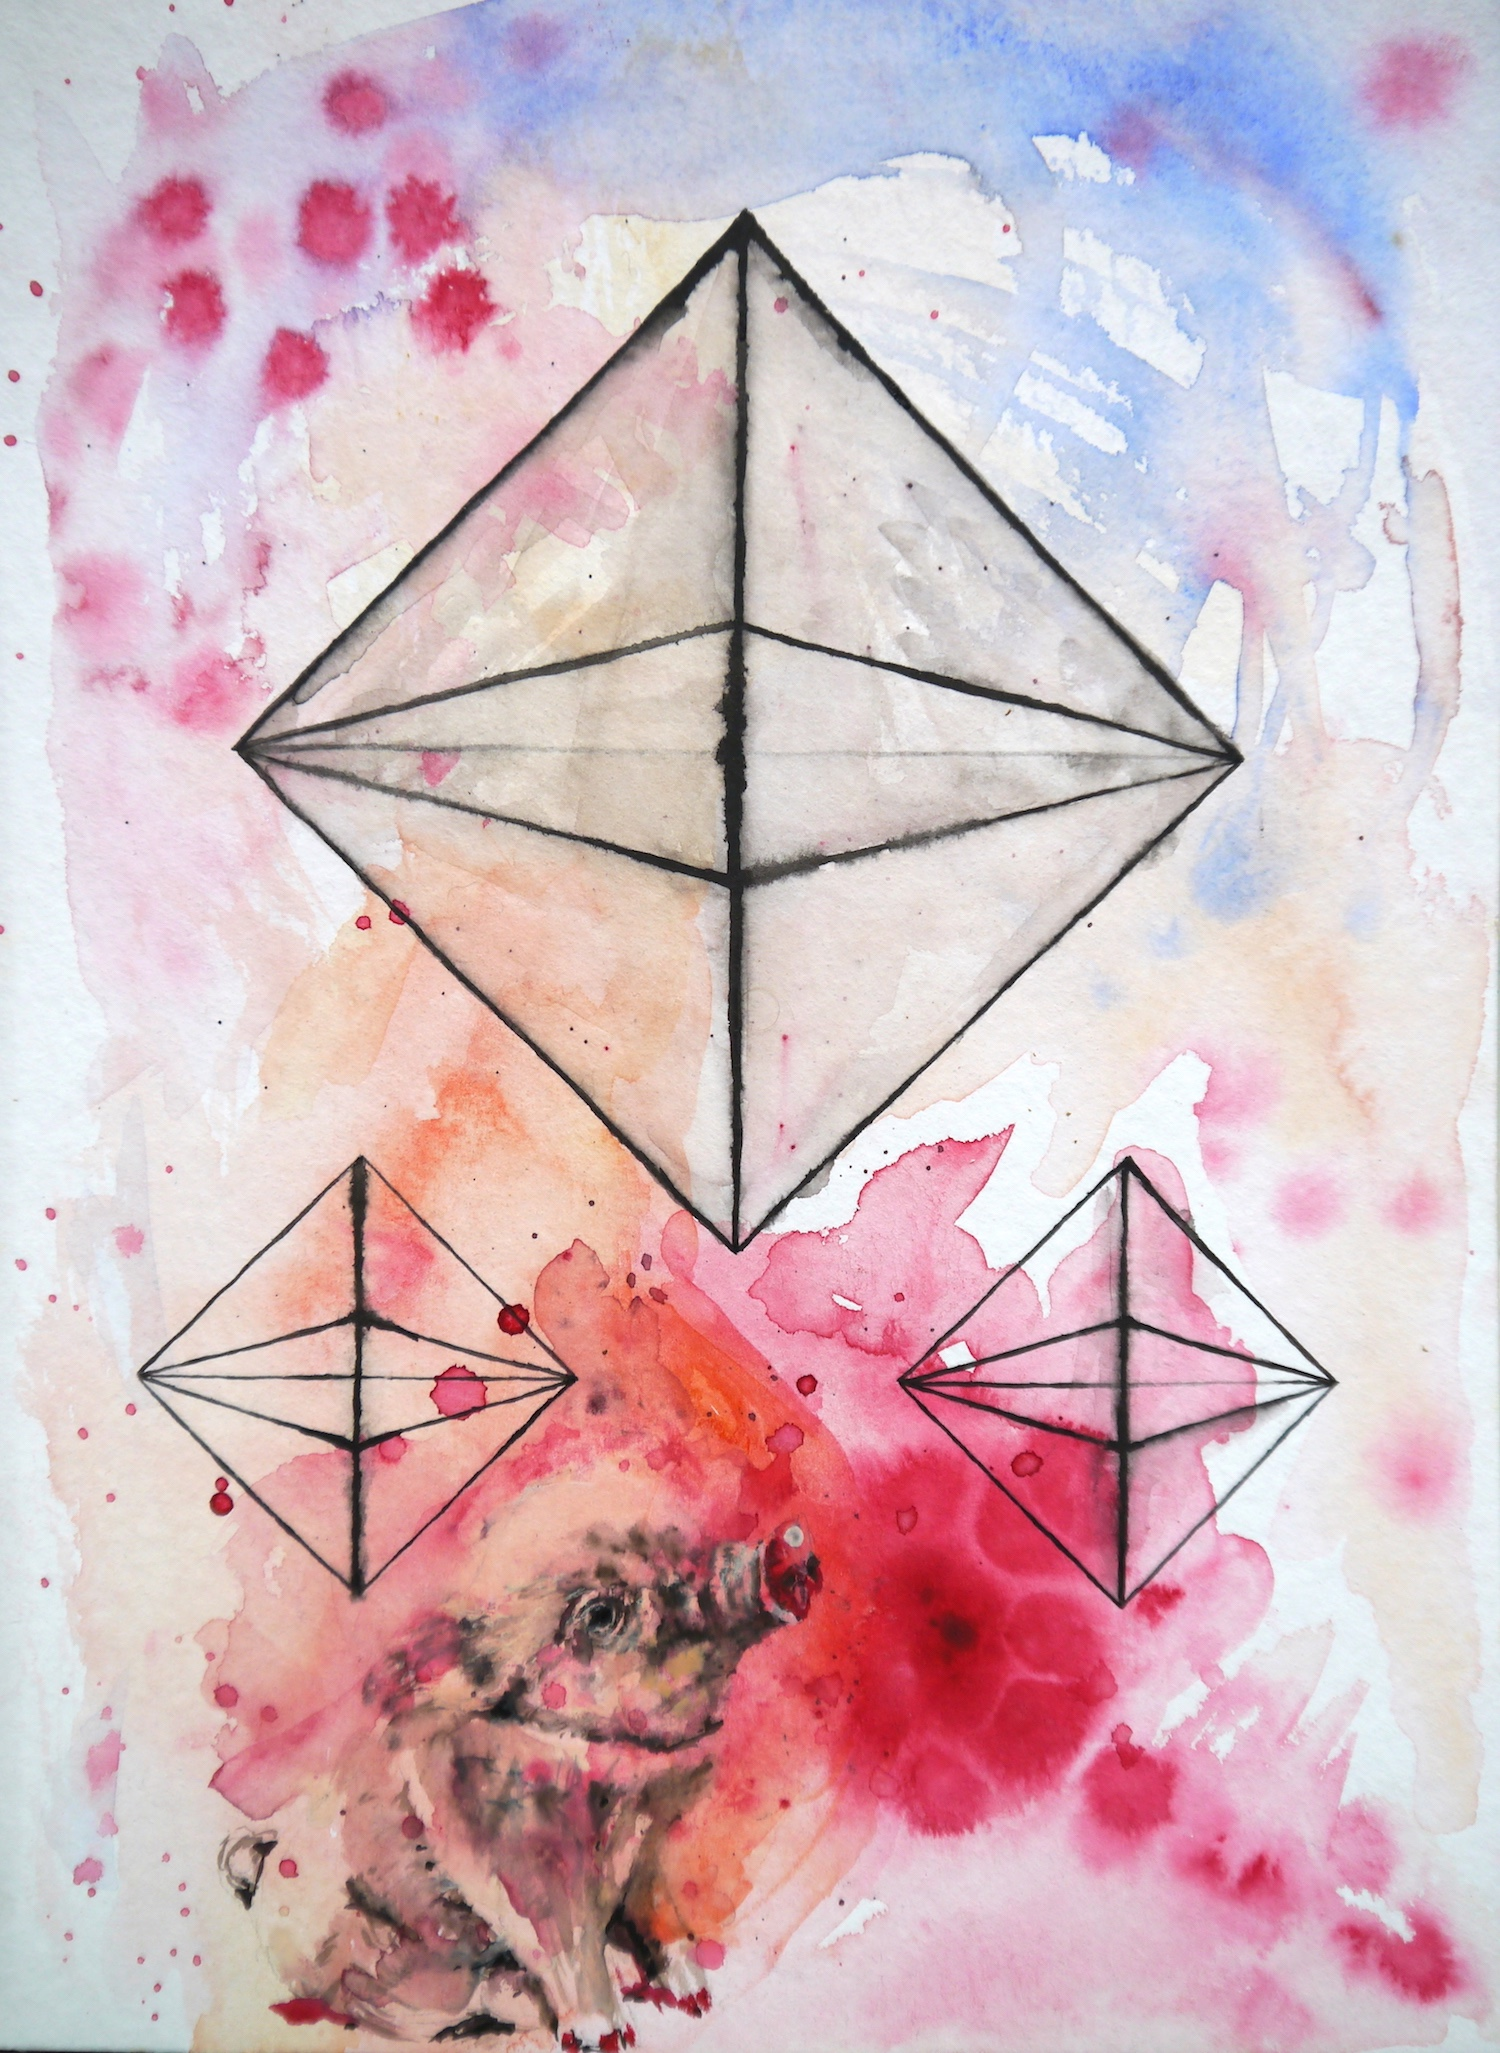 painting art space watercolor geometry geometrie aquarell cosmos cosmic malerei universe universum formen colorful silence aesthetic  kunst pic